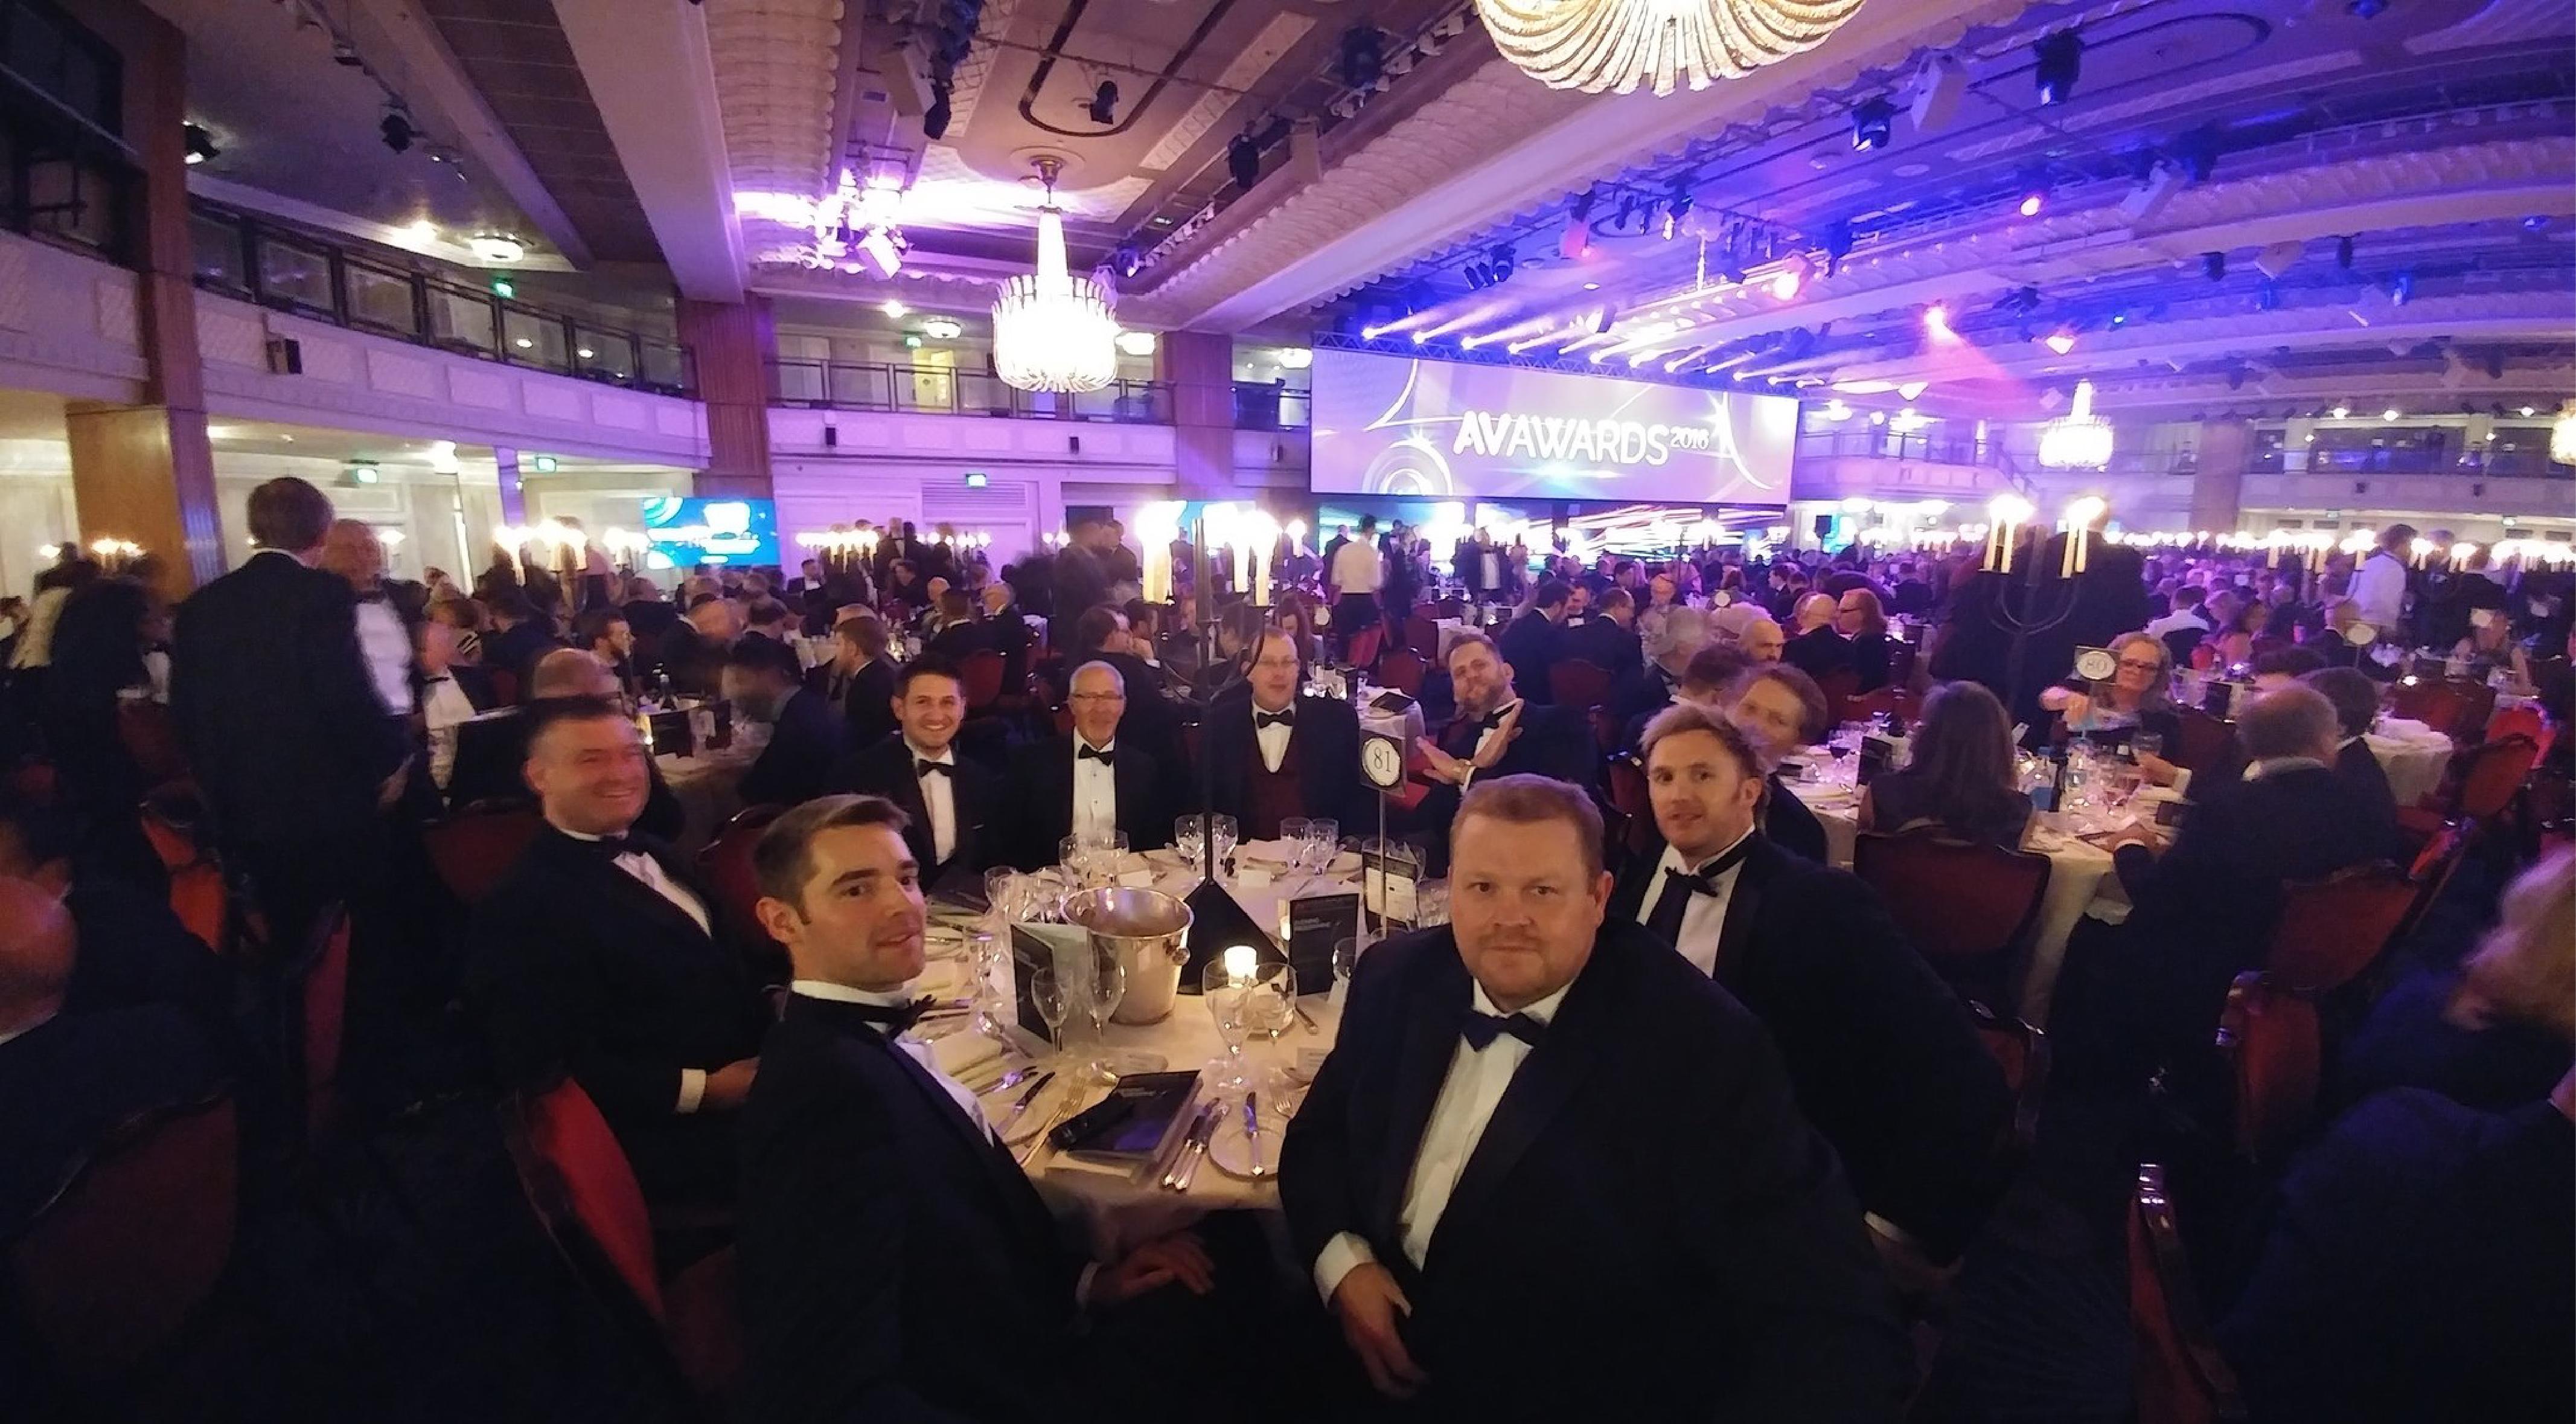 AV Awards 2016 - The B-Tech Table